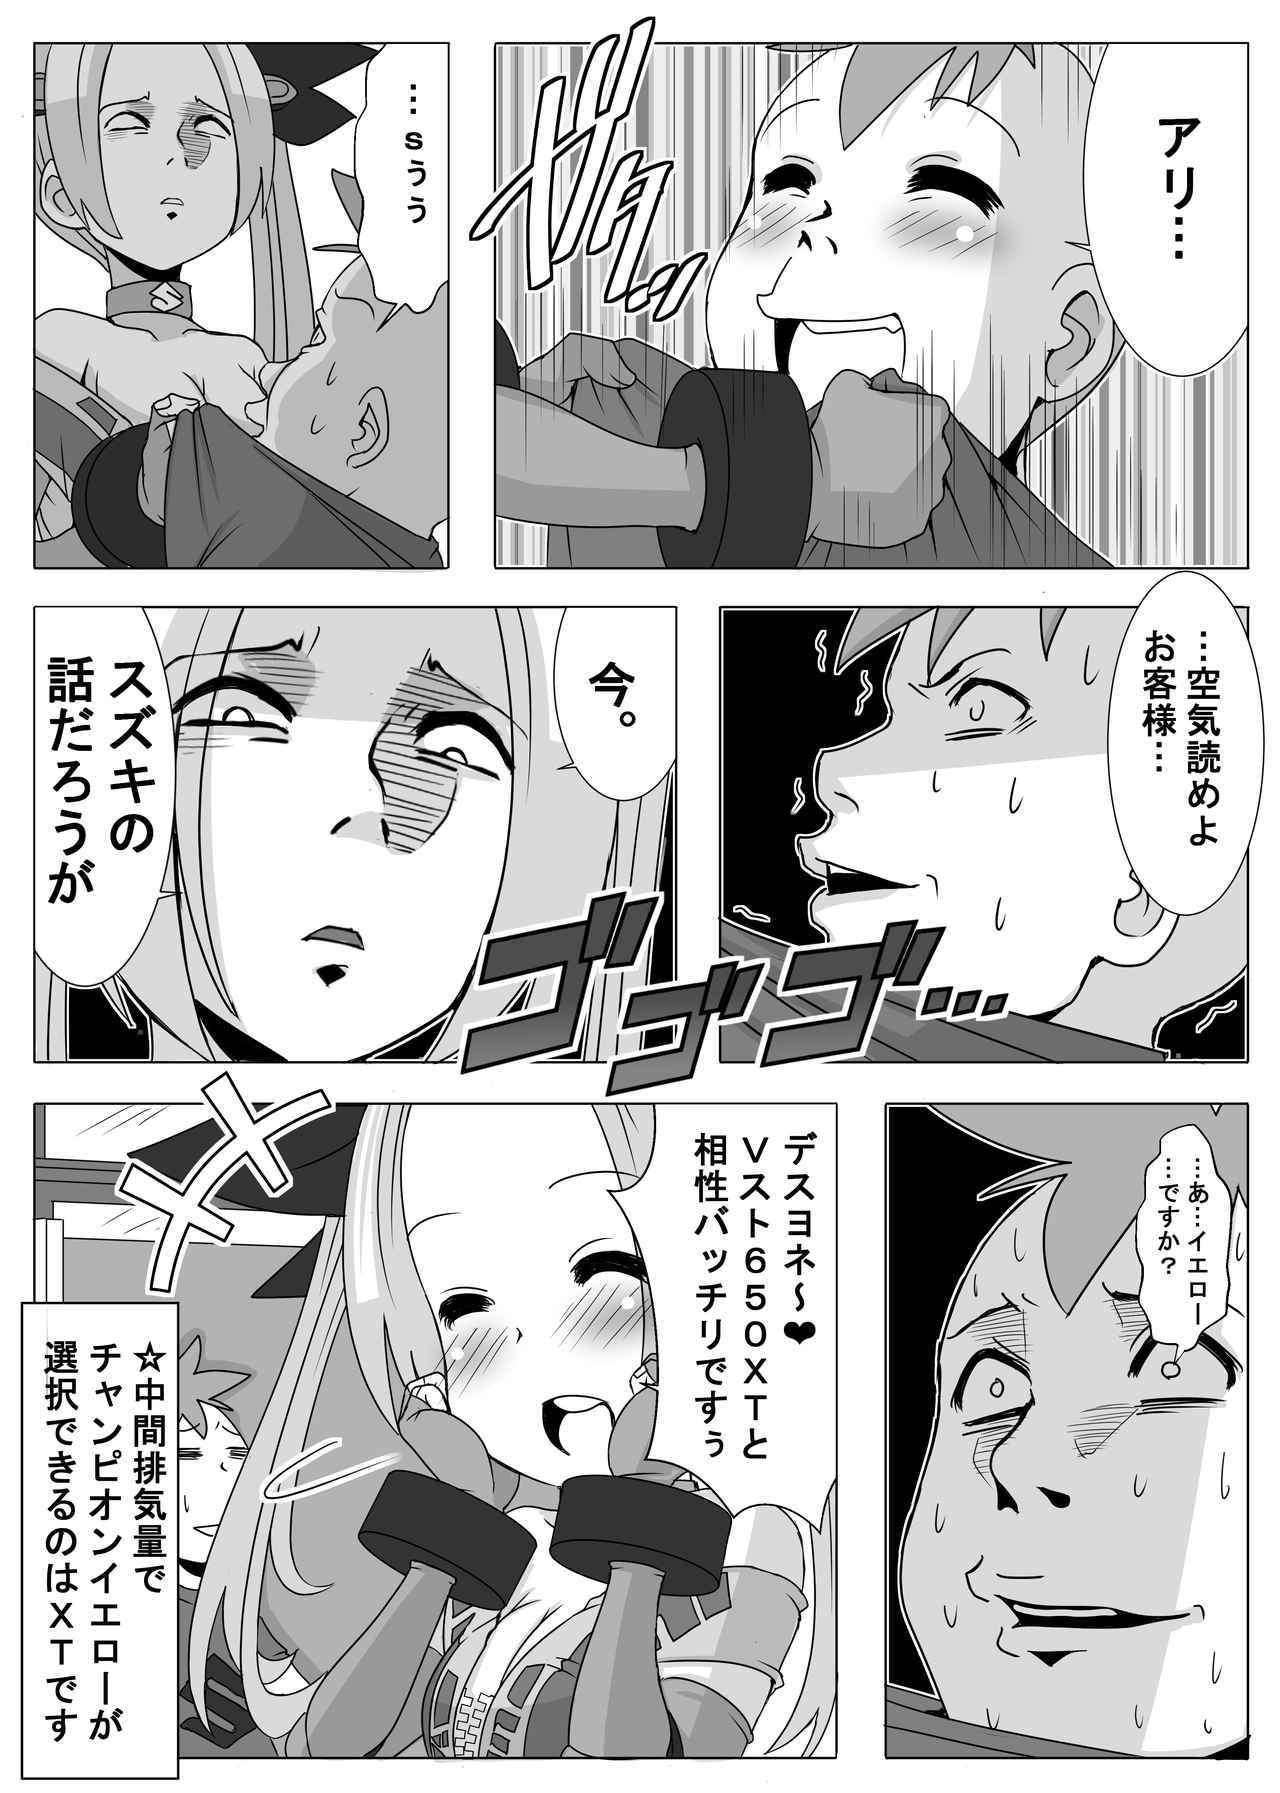 画像4: 『バイク擬人化菌書』V-strom650XT 話「相性」 作:鈴木秀吉